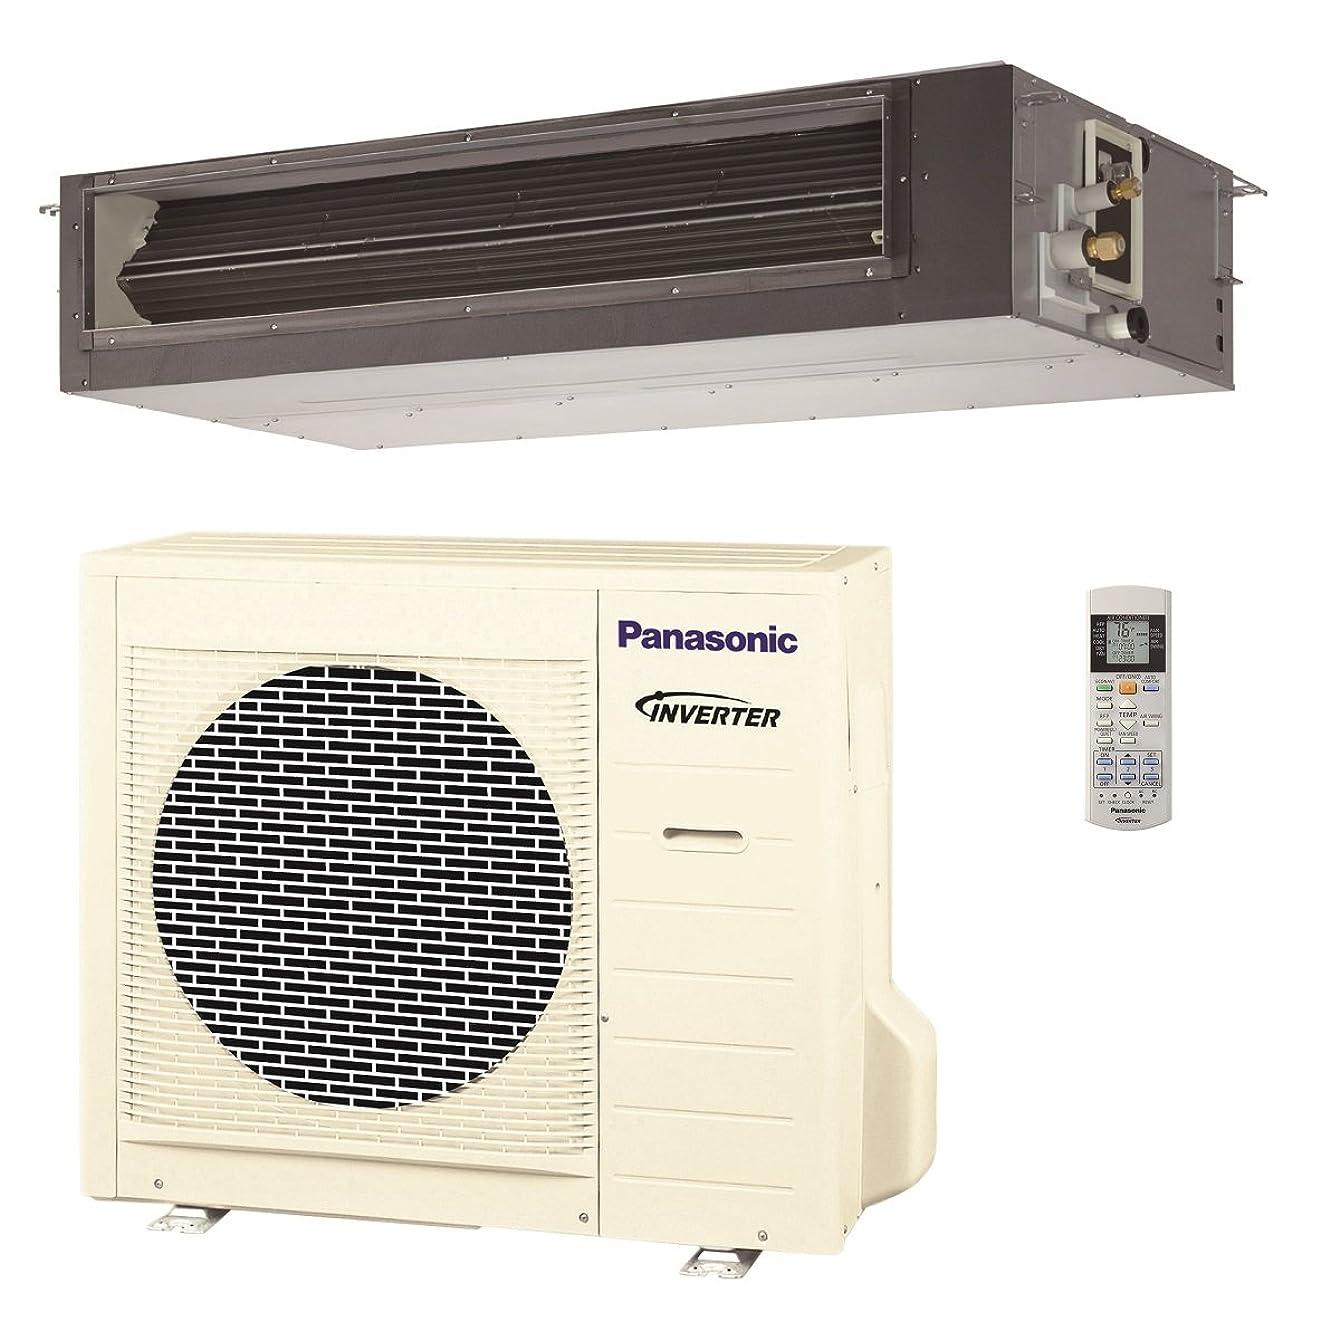 Panasonic Air Conditioning/Heating System, 18,000 BTU, 2 Piece